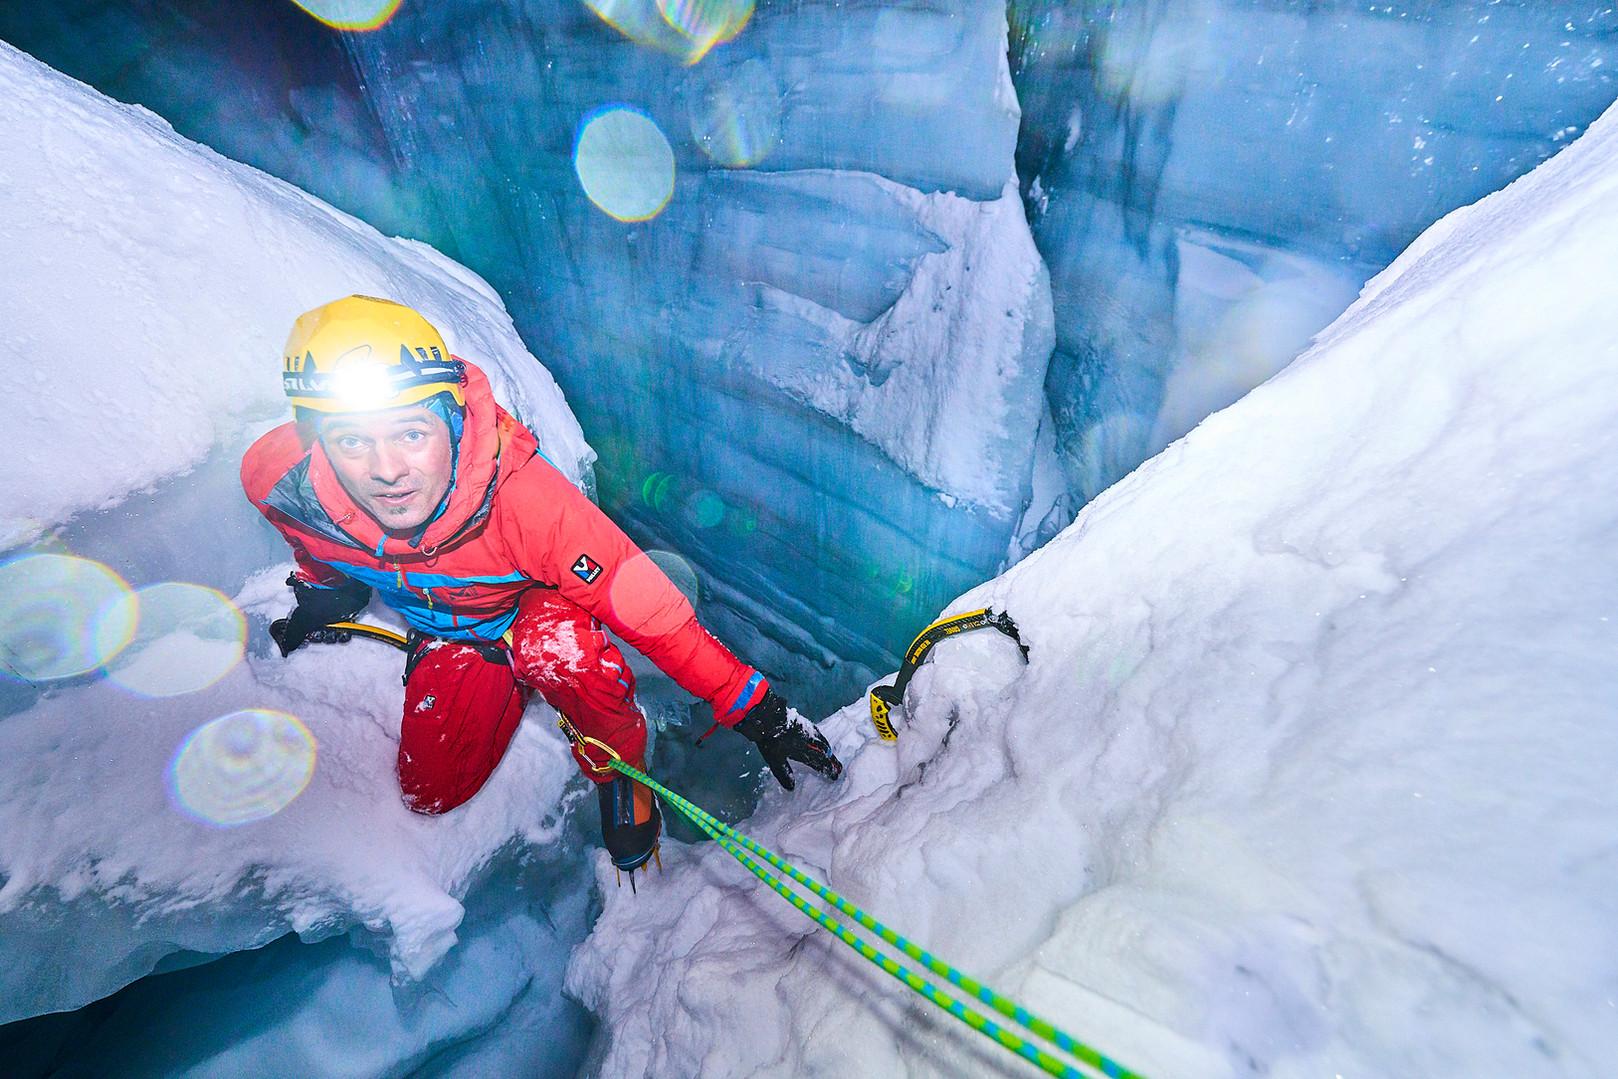 alps mountaineering, iceclimbing, Mike Fuchs